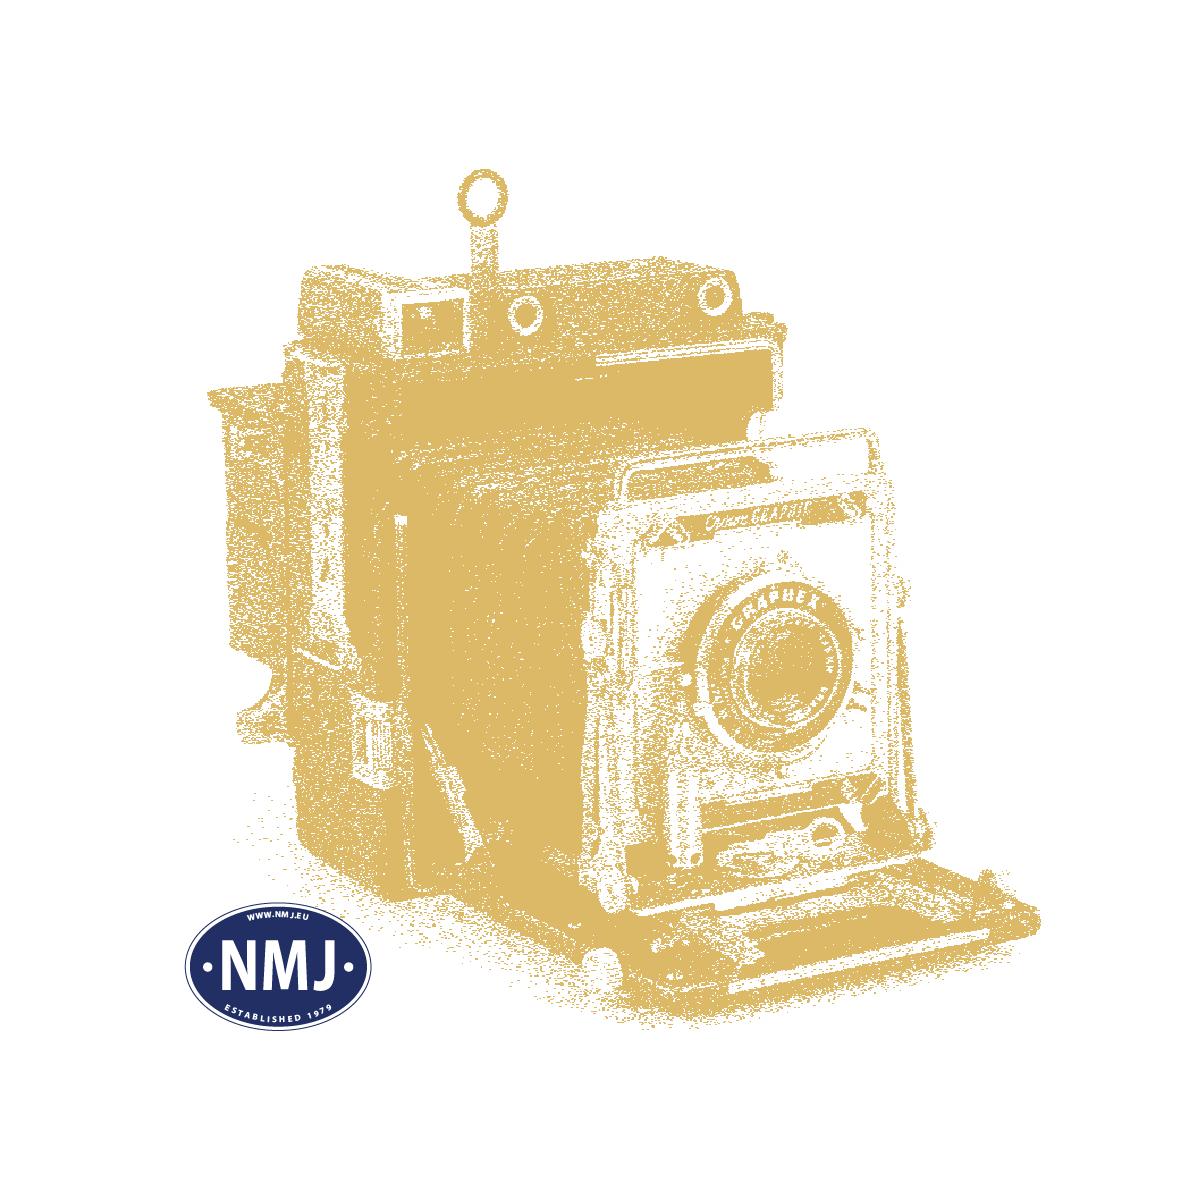 NOC15928 - Vinterarbeid